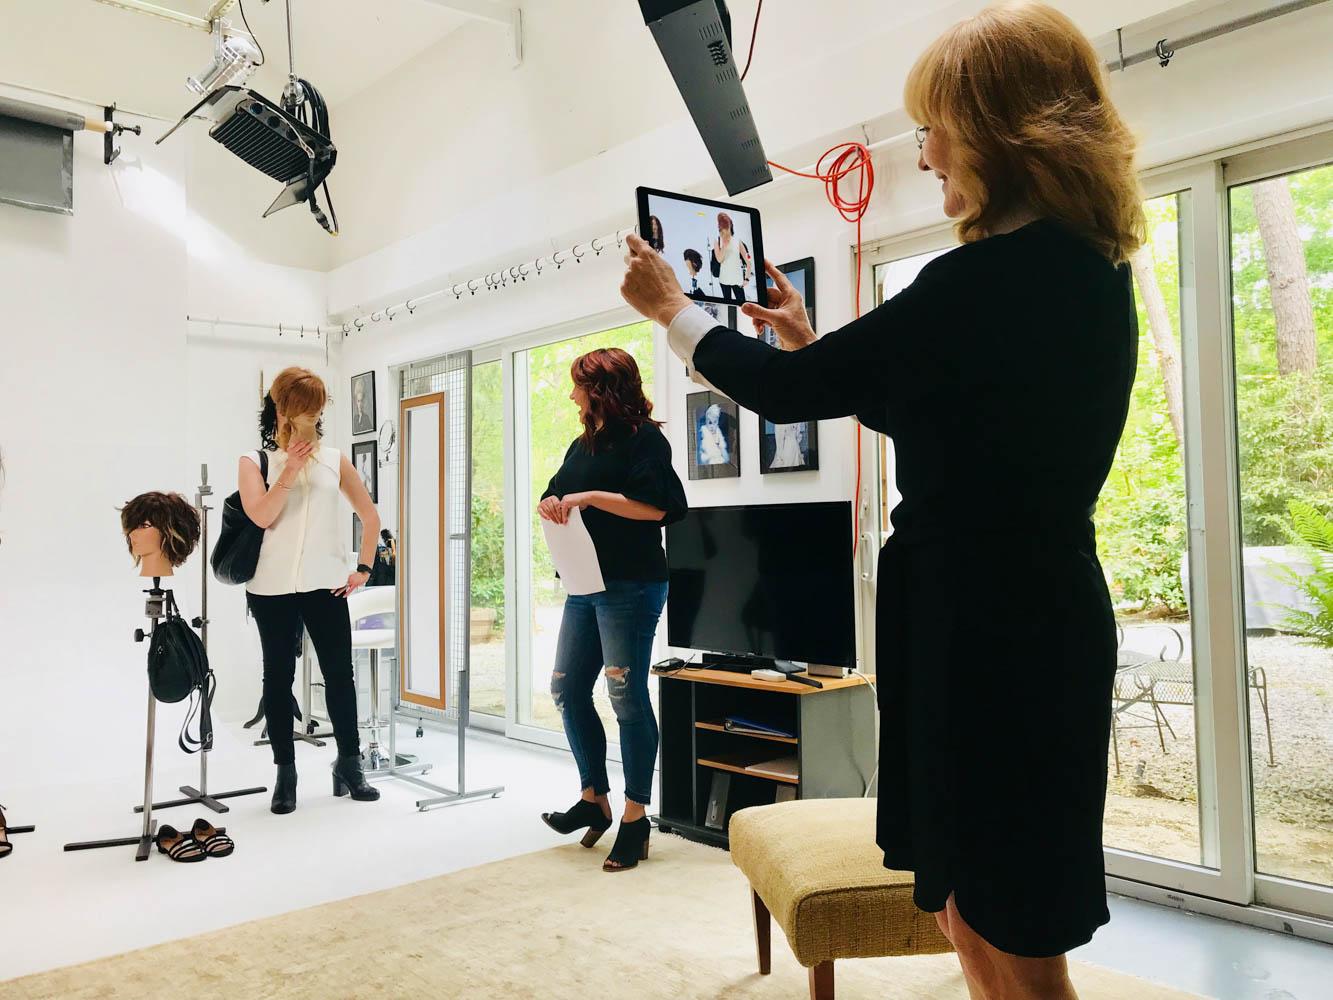 Vivienne Mackinder snima look&learn frizerski seminar